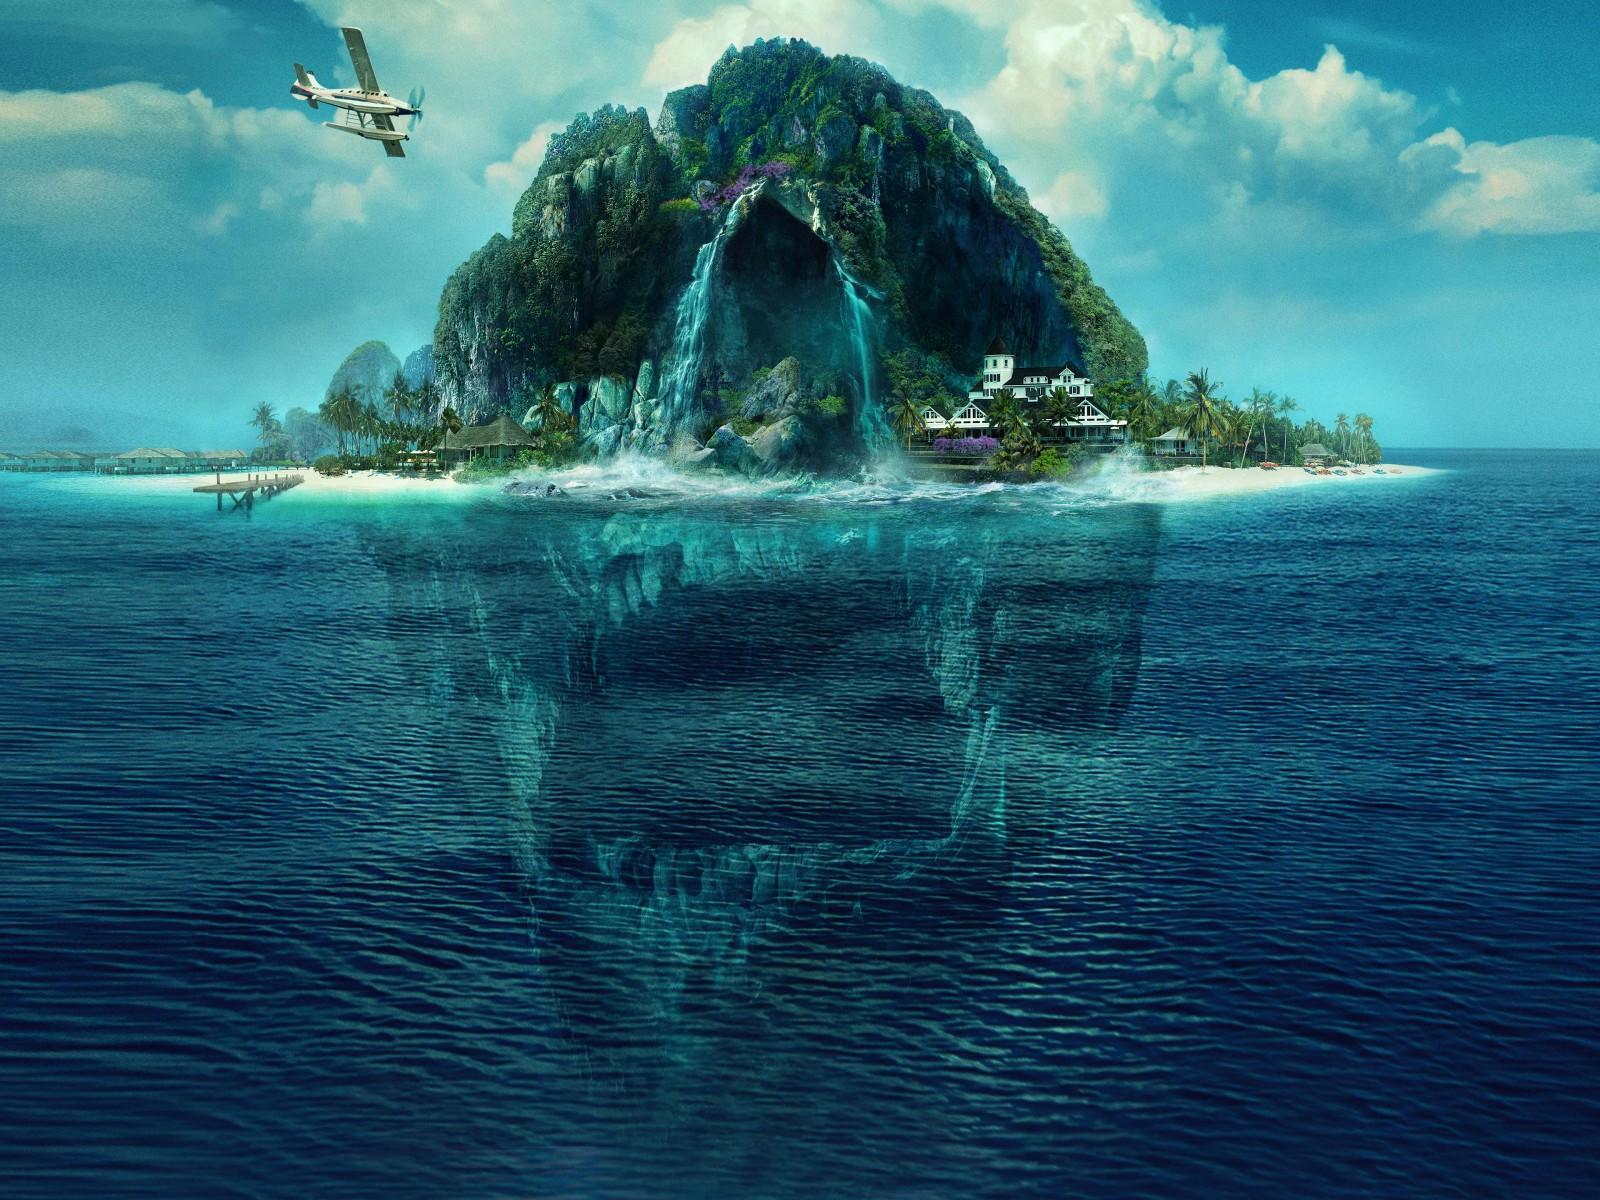 Fantasy Island 2020 4K 5K HD desktop wallpaper Widescreen High 1600x1200